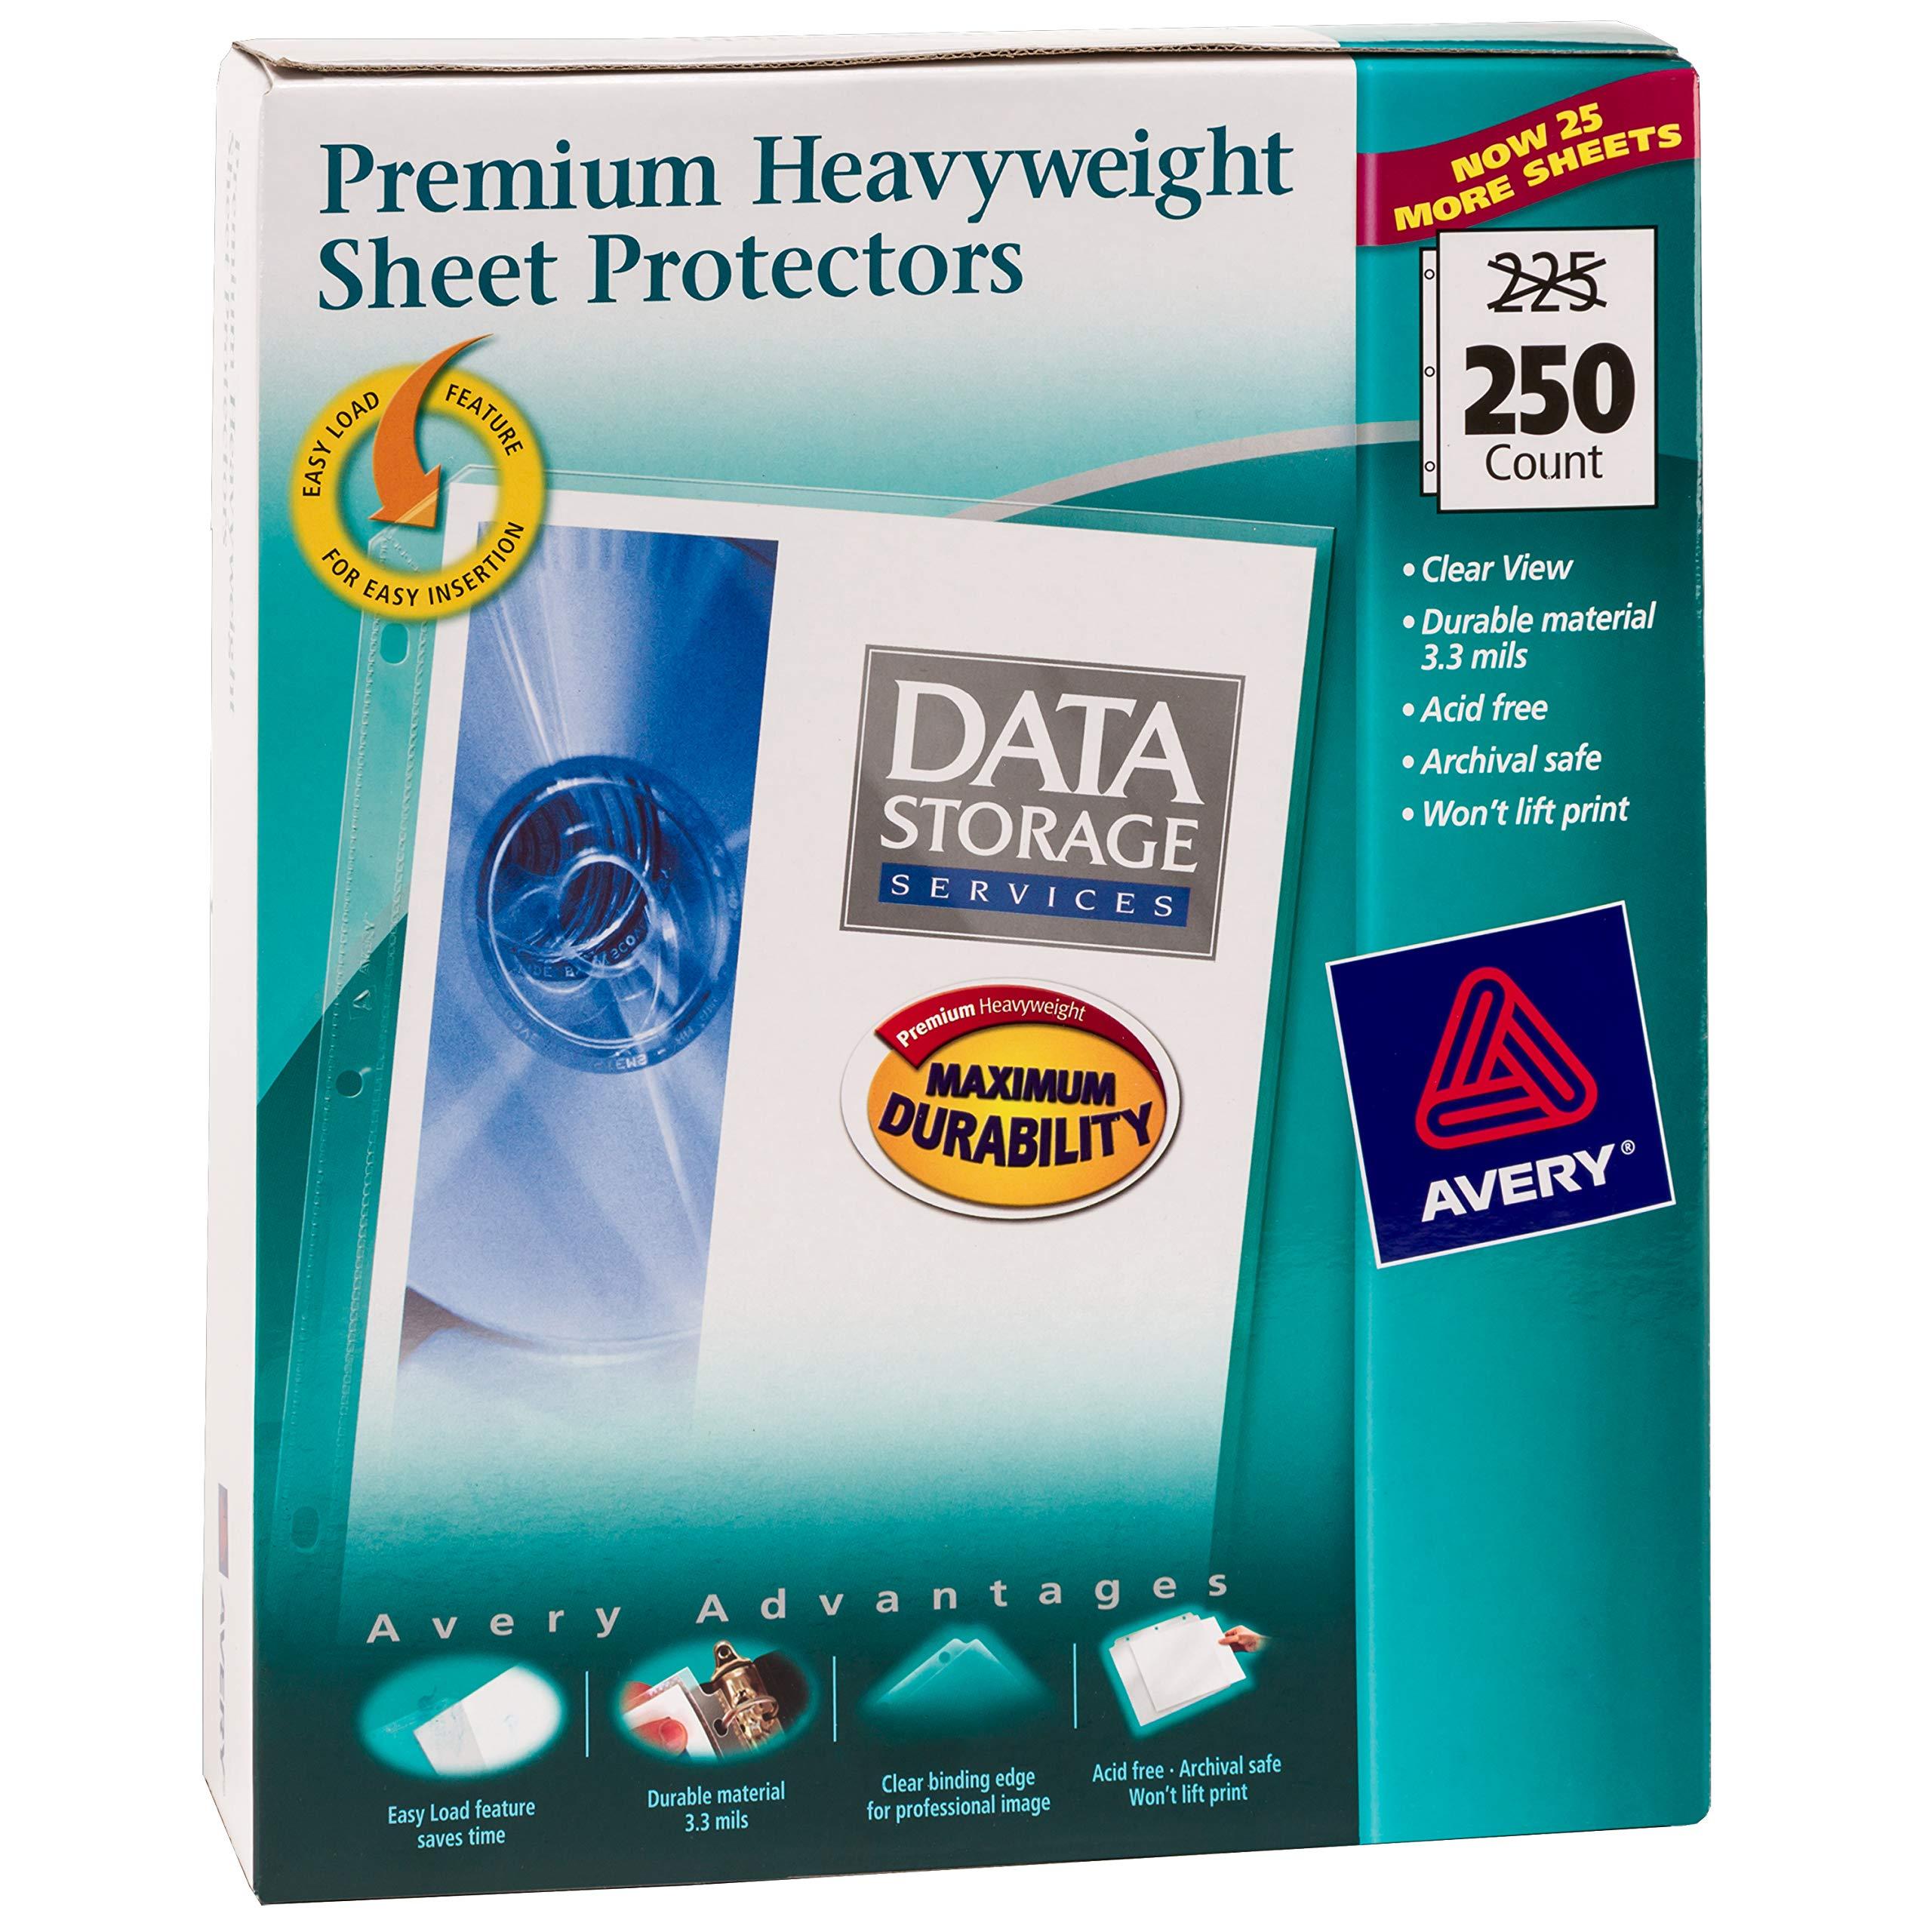 Avery Premium Heavyweight Diamond Clear Sheet Protectors, 8.5'' x 11'', Acid-Free, Easy Load, 250ct (76006) by AVERY